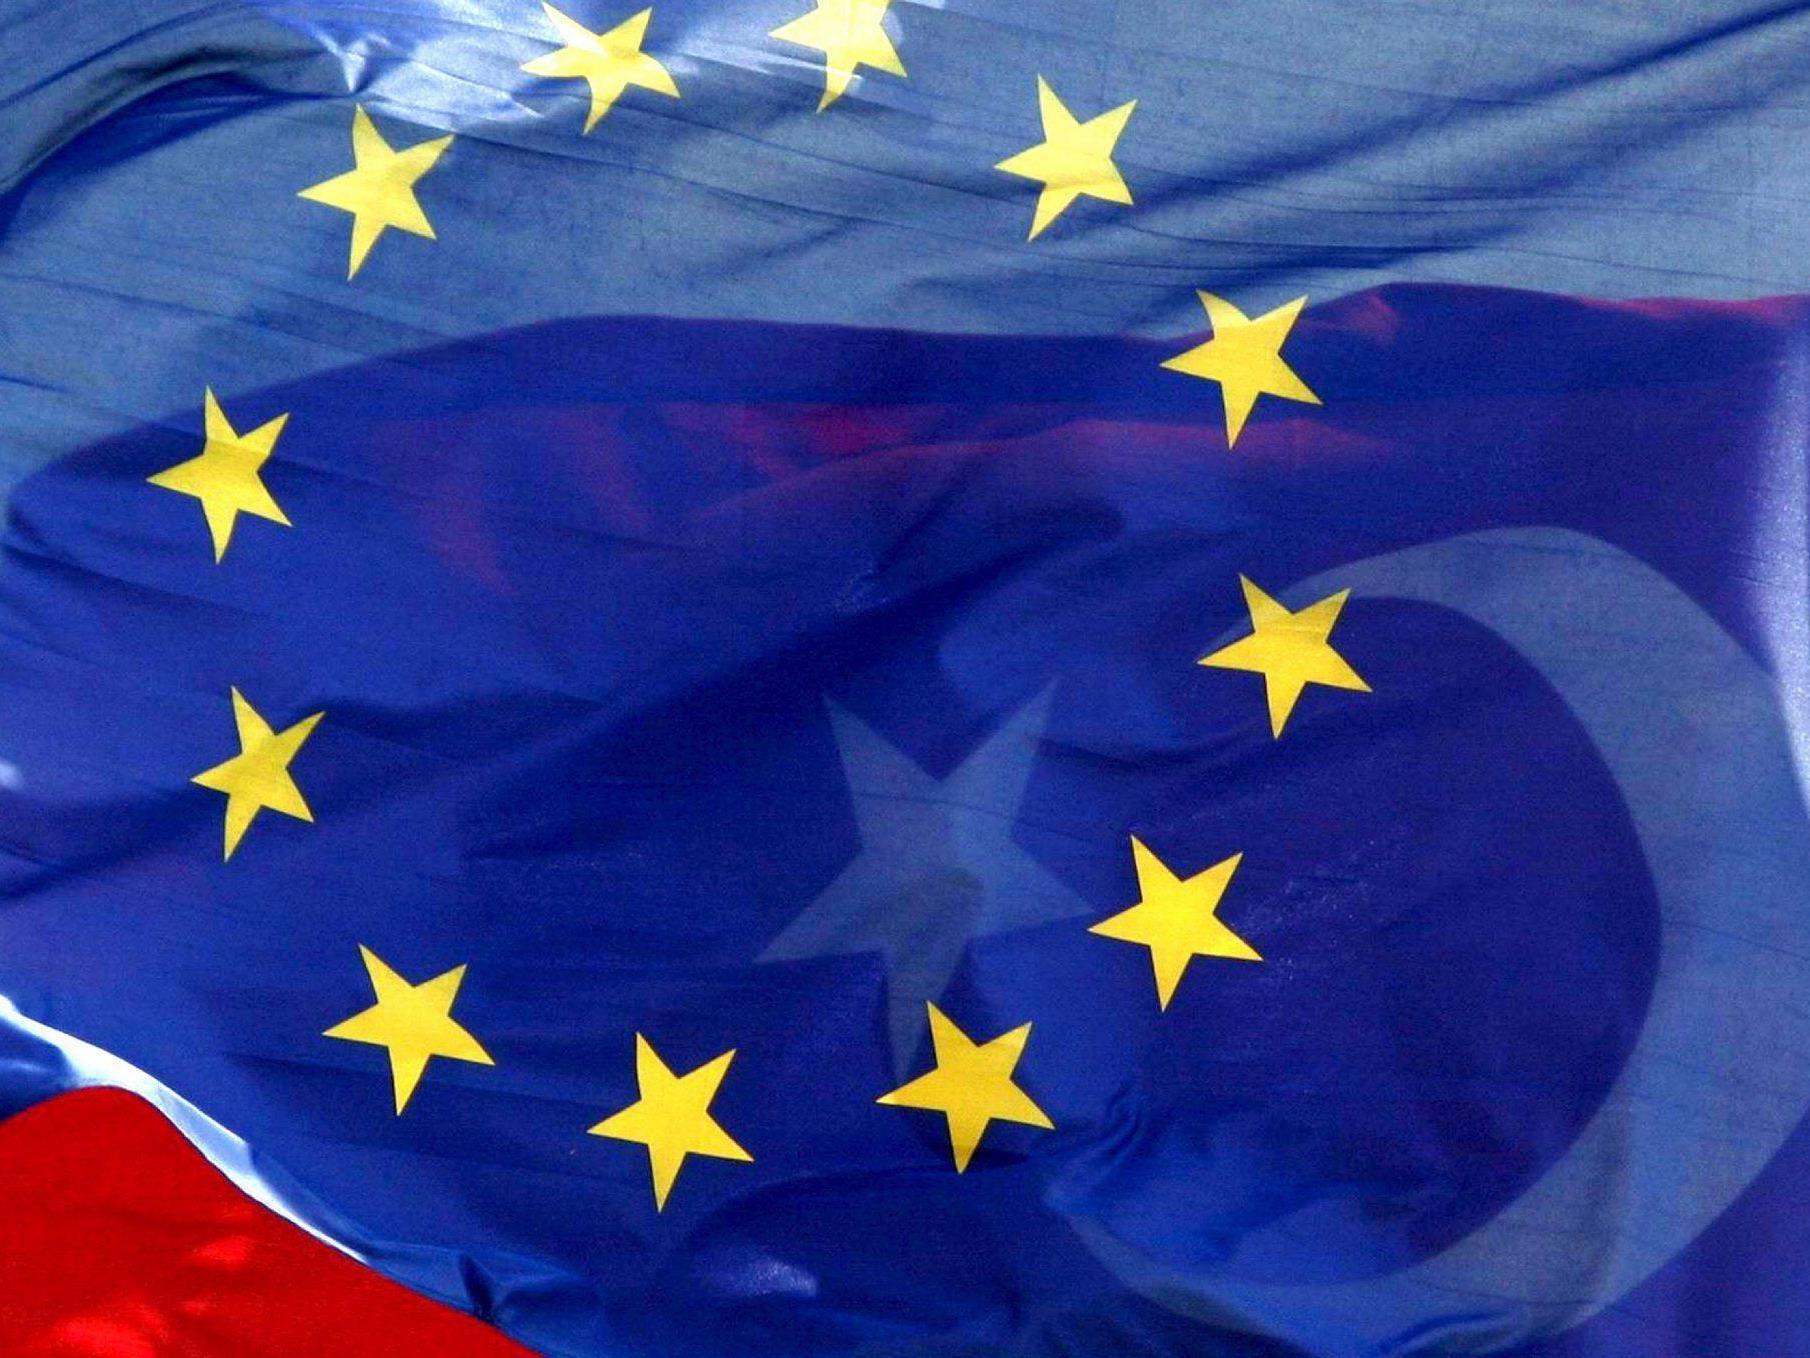 EU-Türkei-Gipfel hofft auf Flüchtlingsabkommen